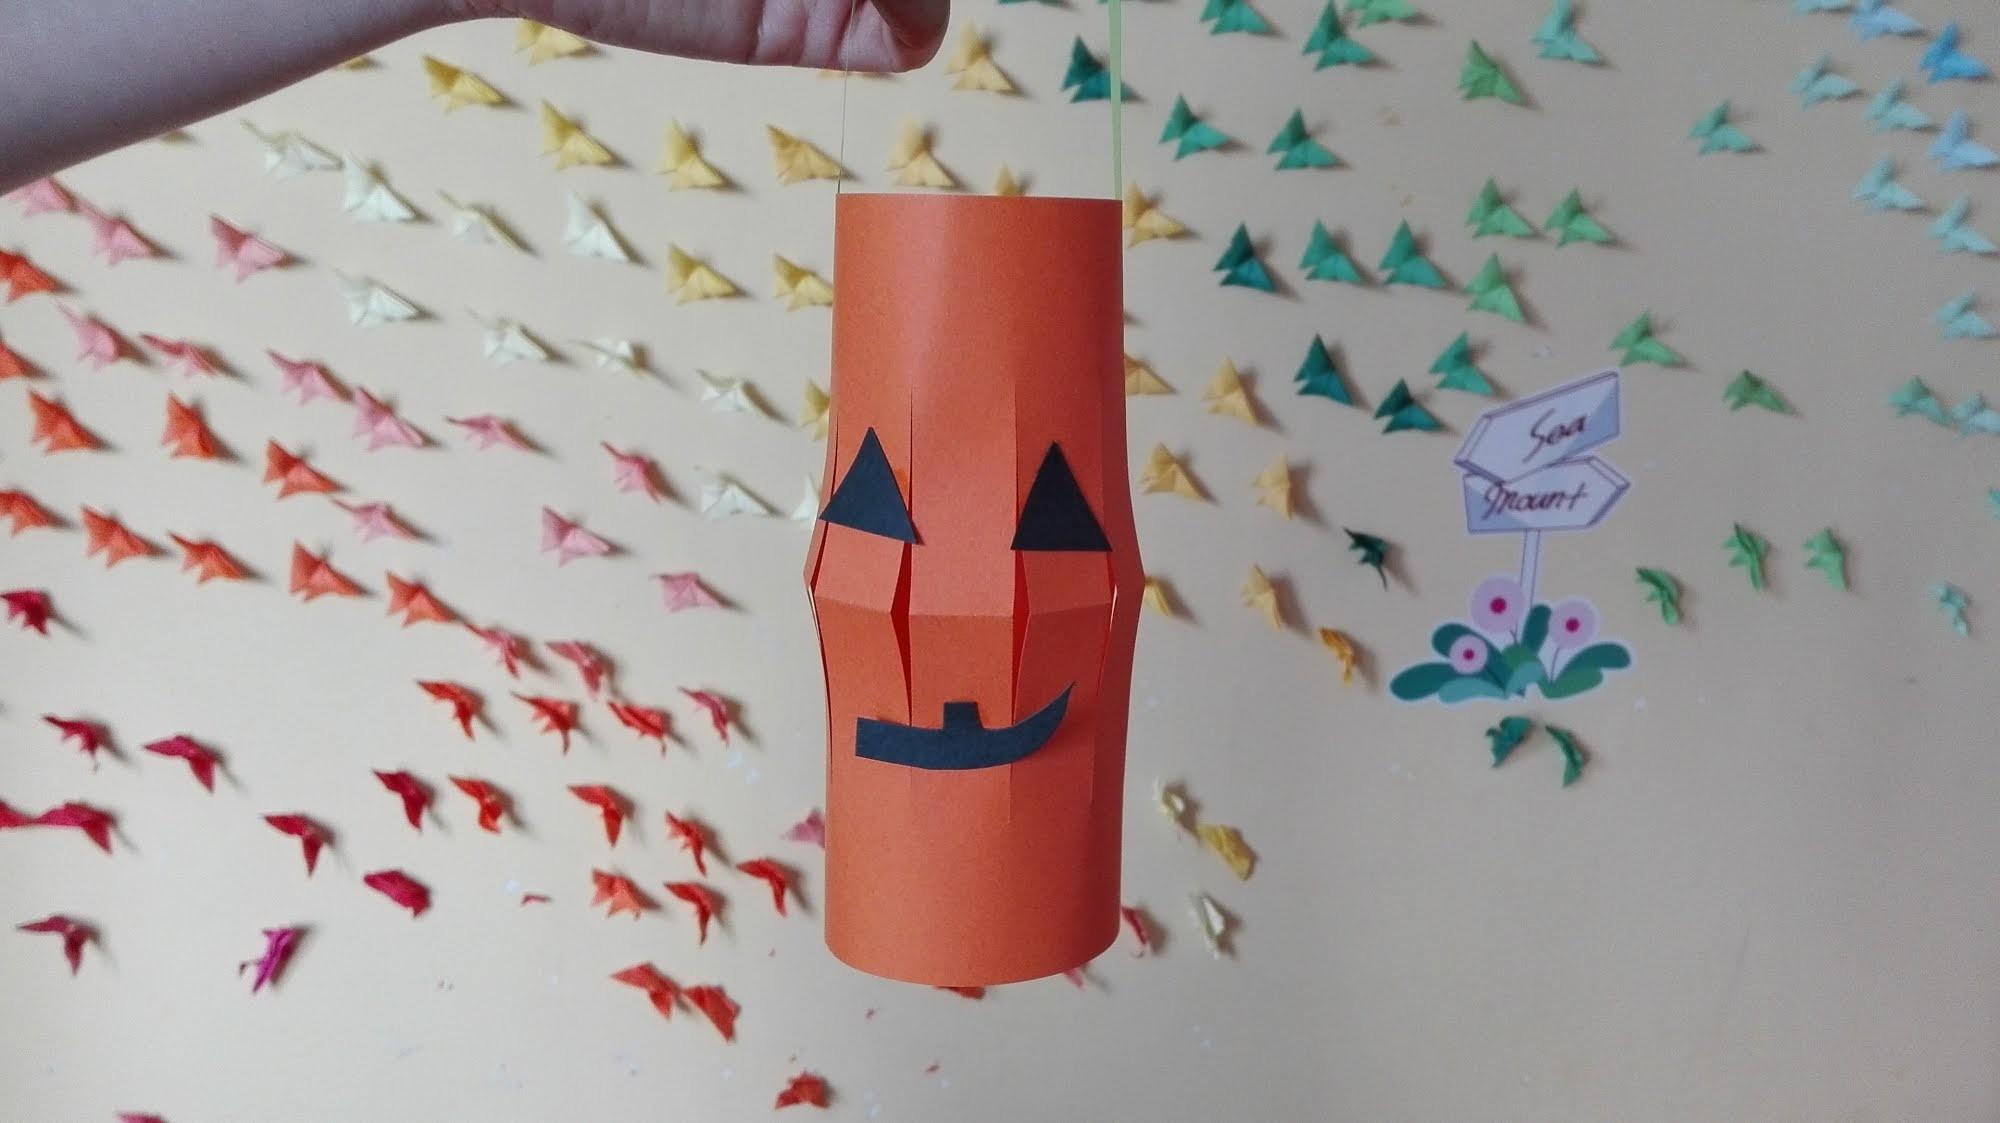 Jak zrobić Dyniowy Lampion z Papieru. How to make a Paper Pumpkin Lantern